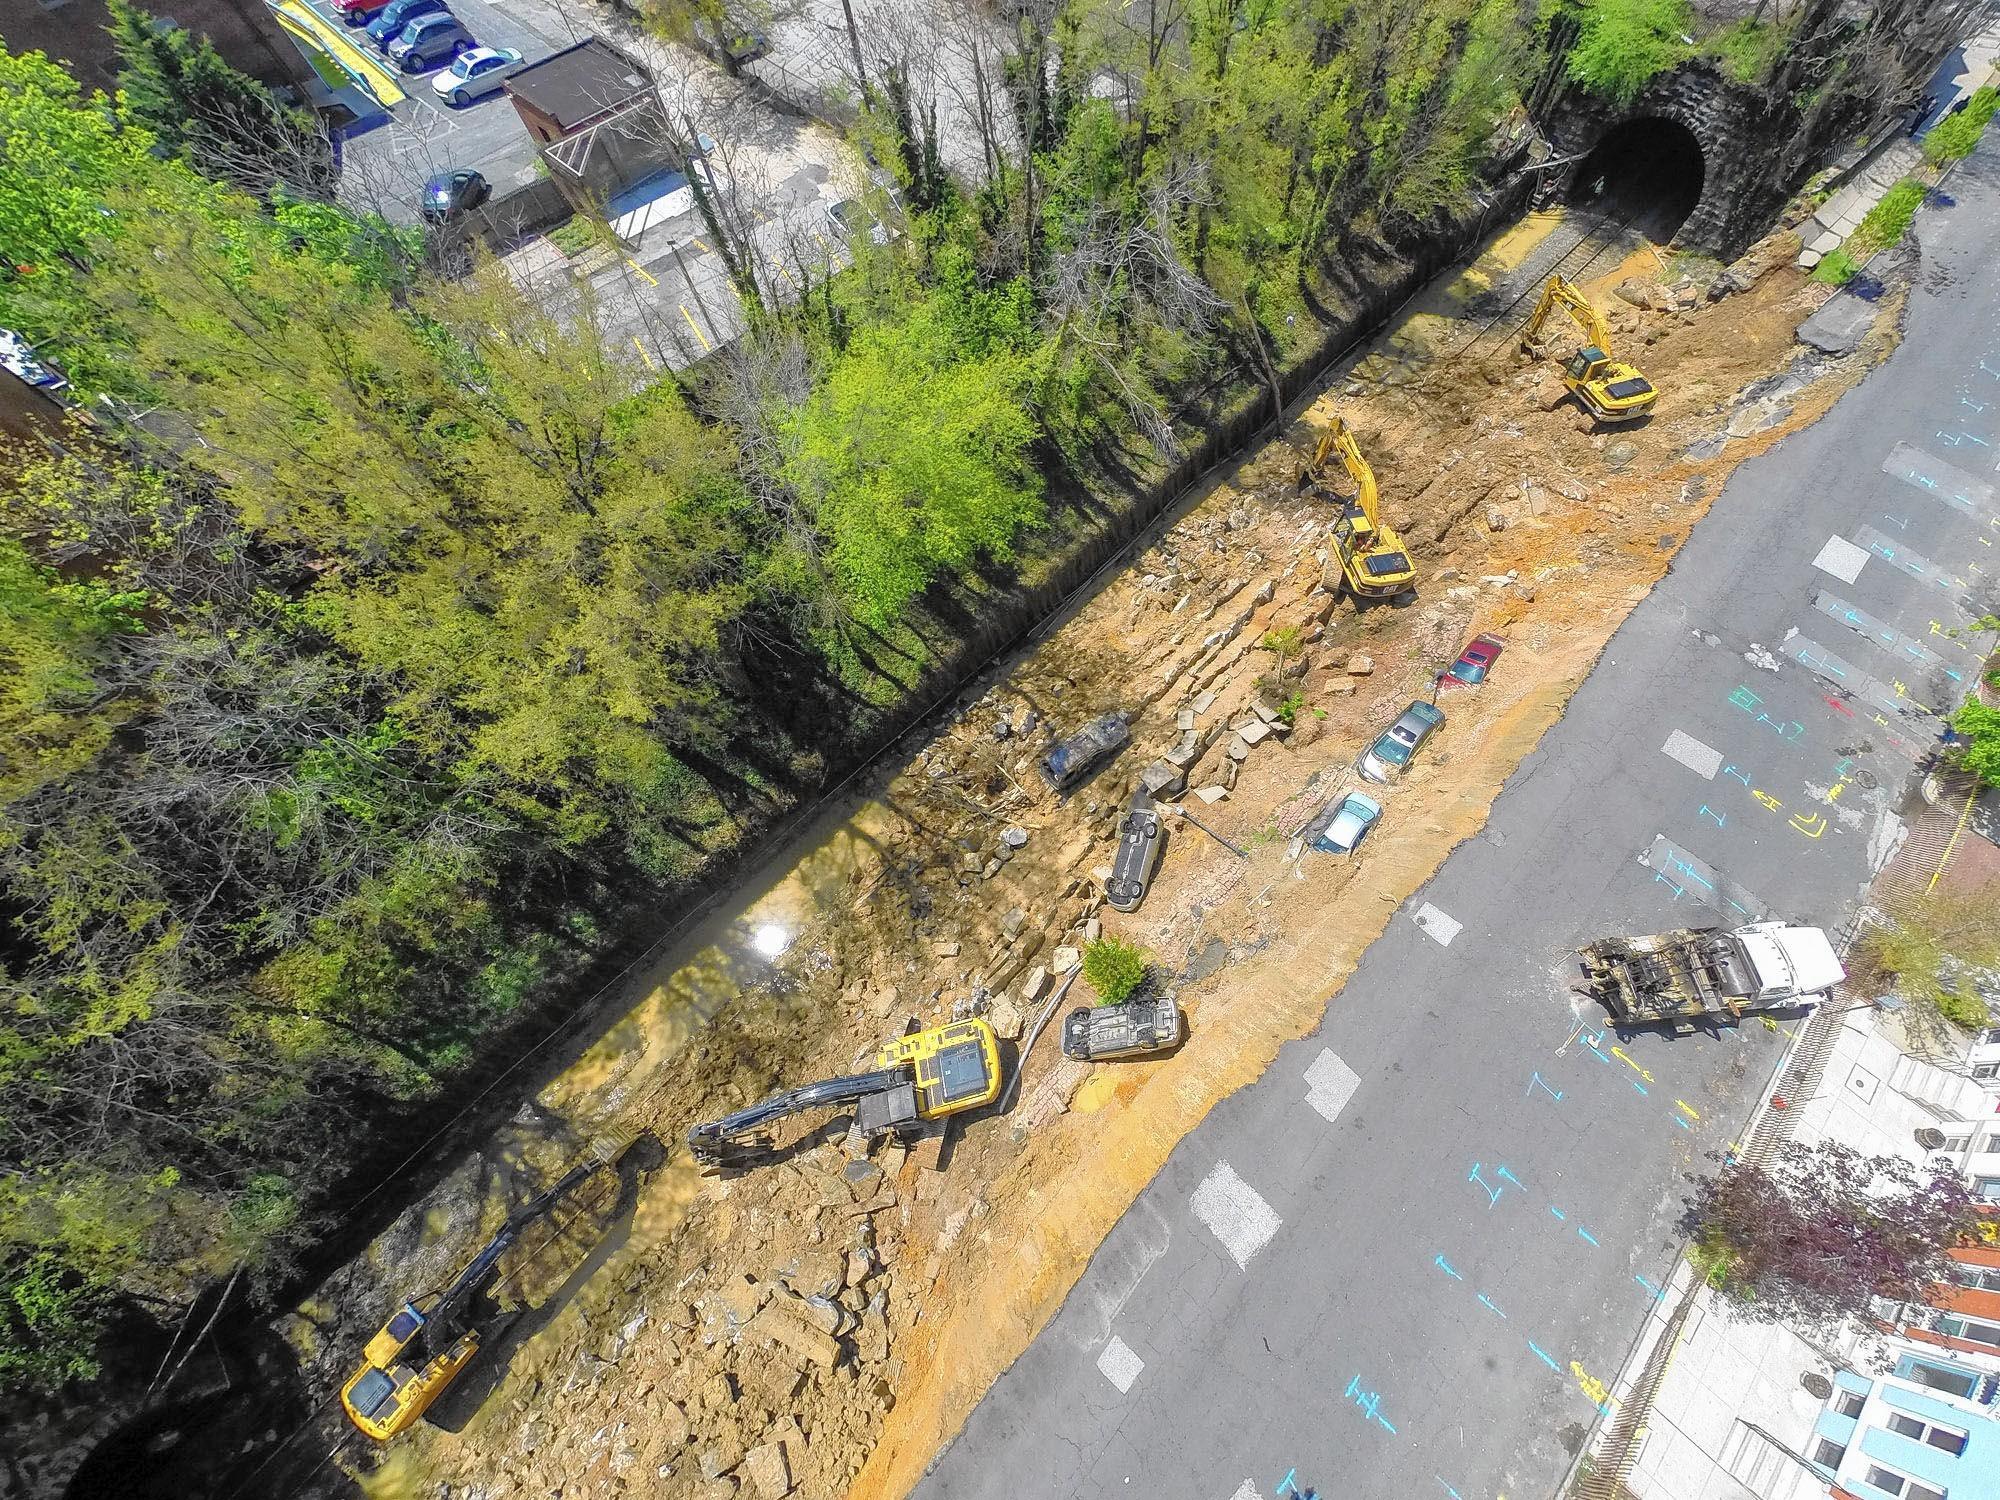 Aerial photos show the Charles Village landslide scene.